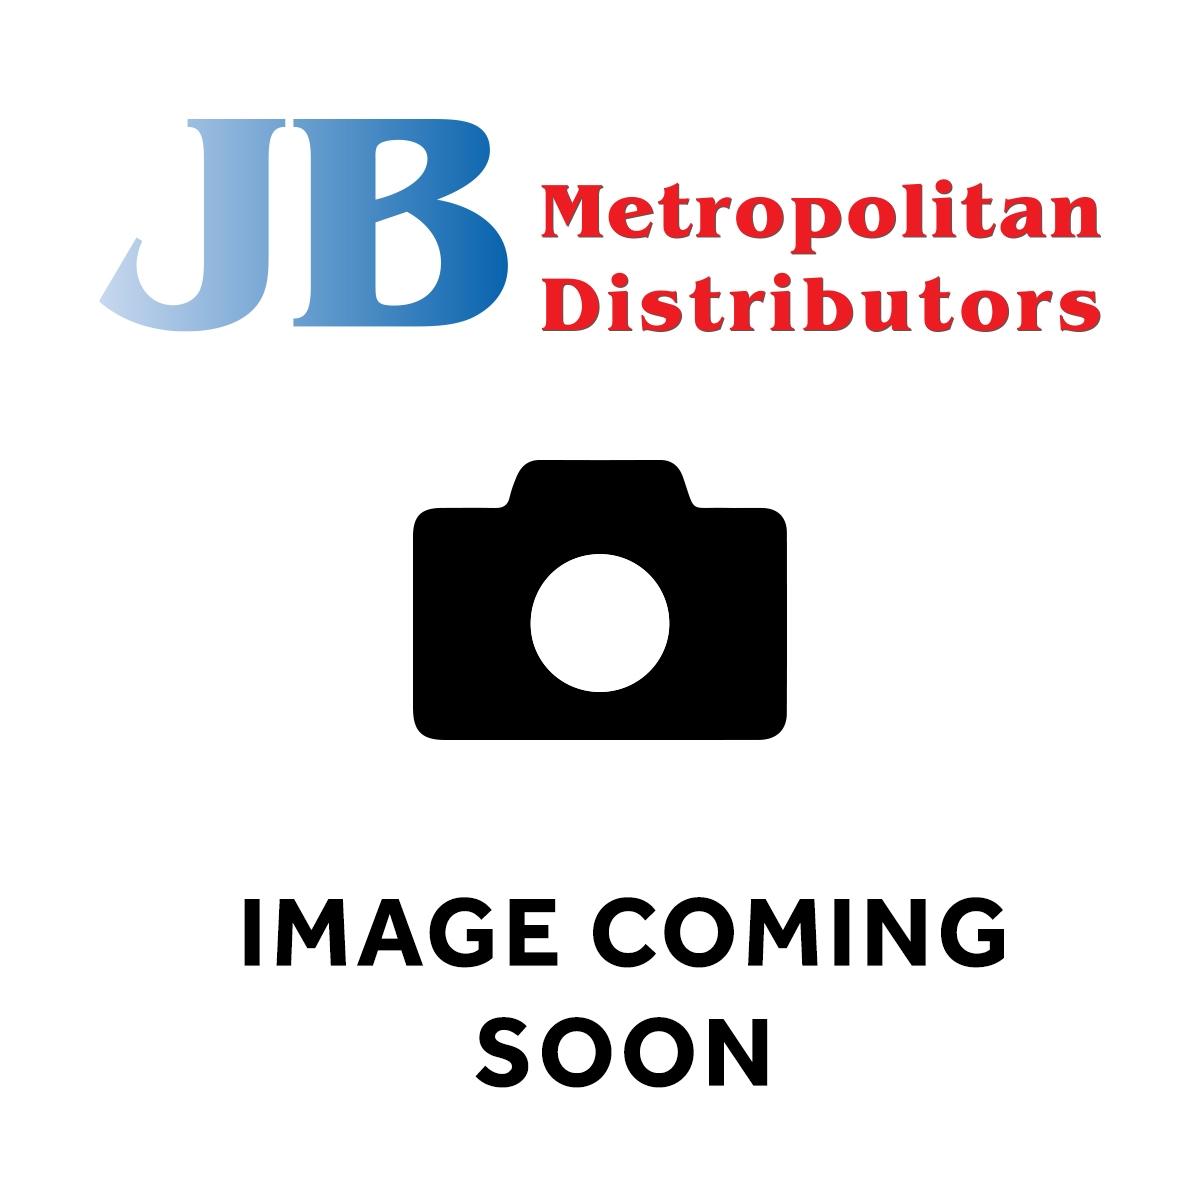 150G KETTLE UPPERCUTS CORN TAPAS JALAPENO CHILLI & MANUKA HONEY